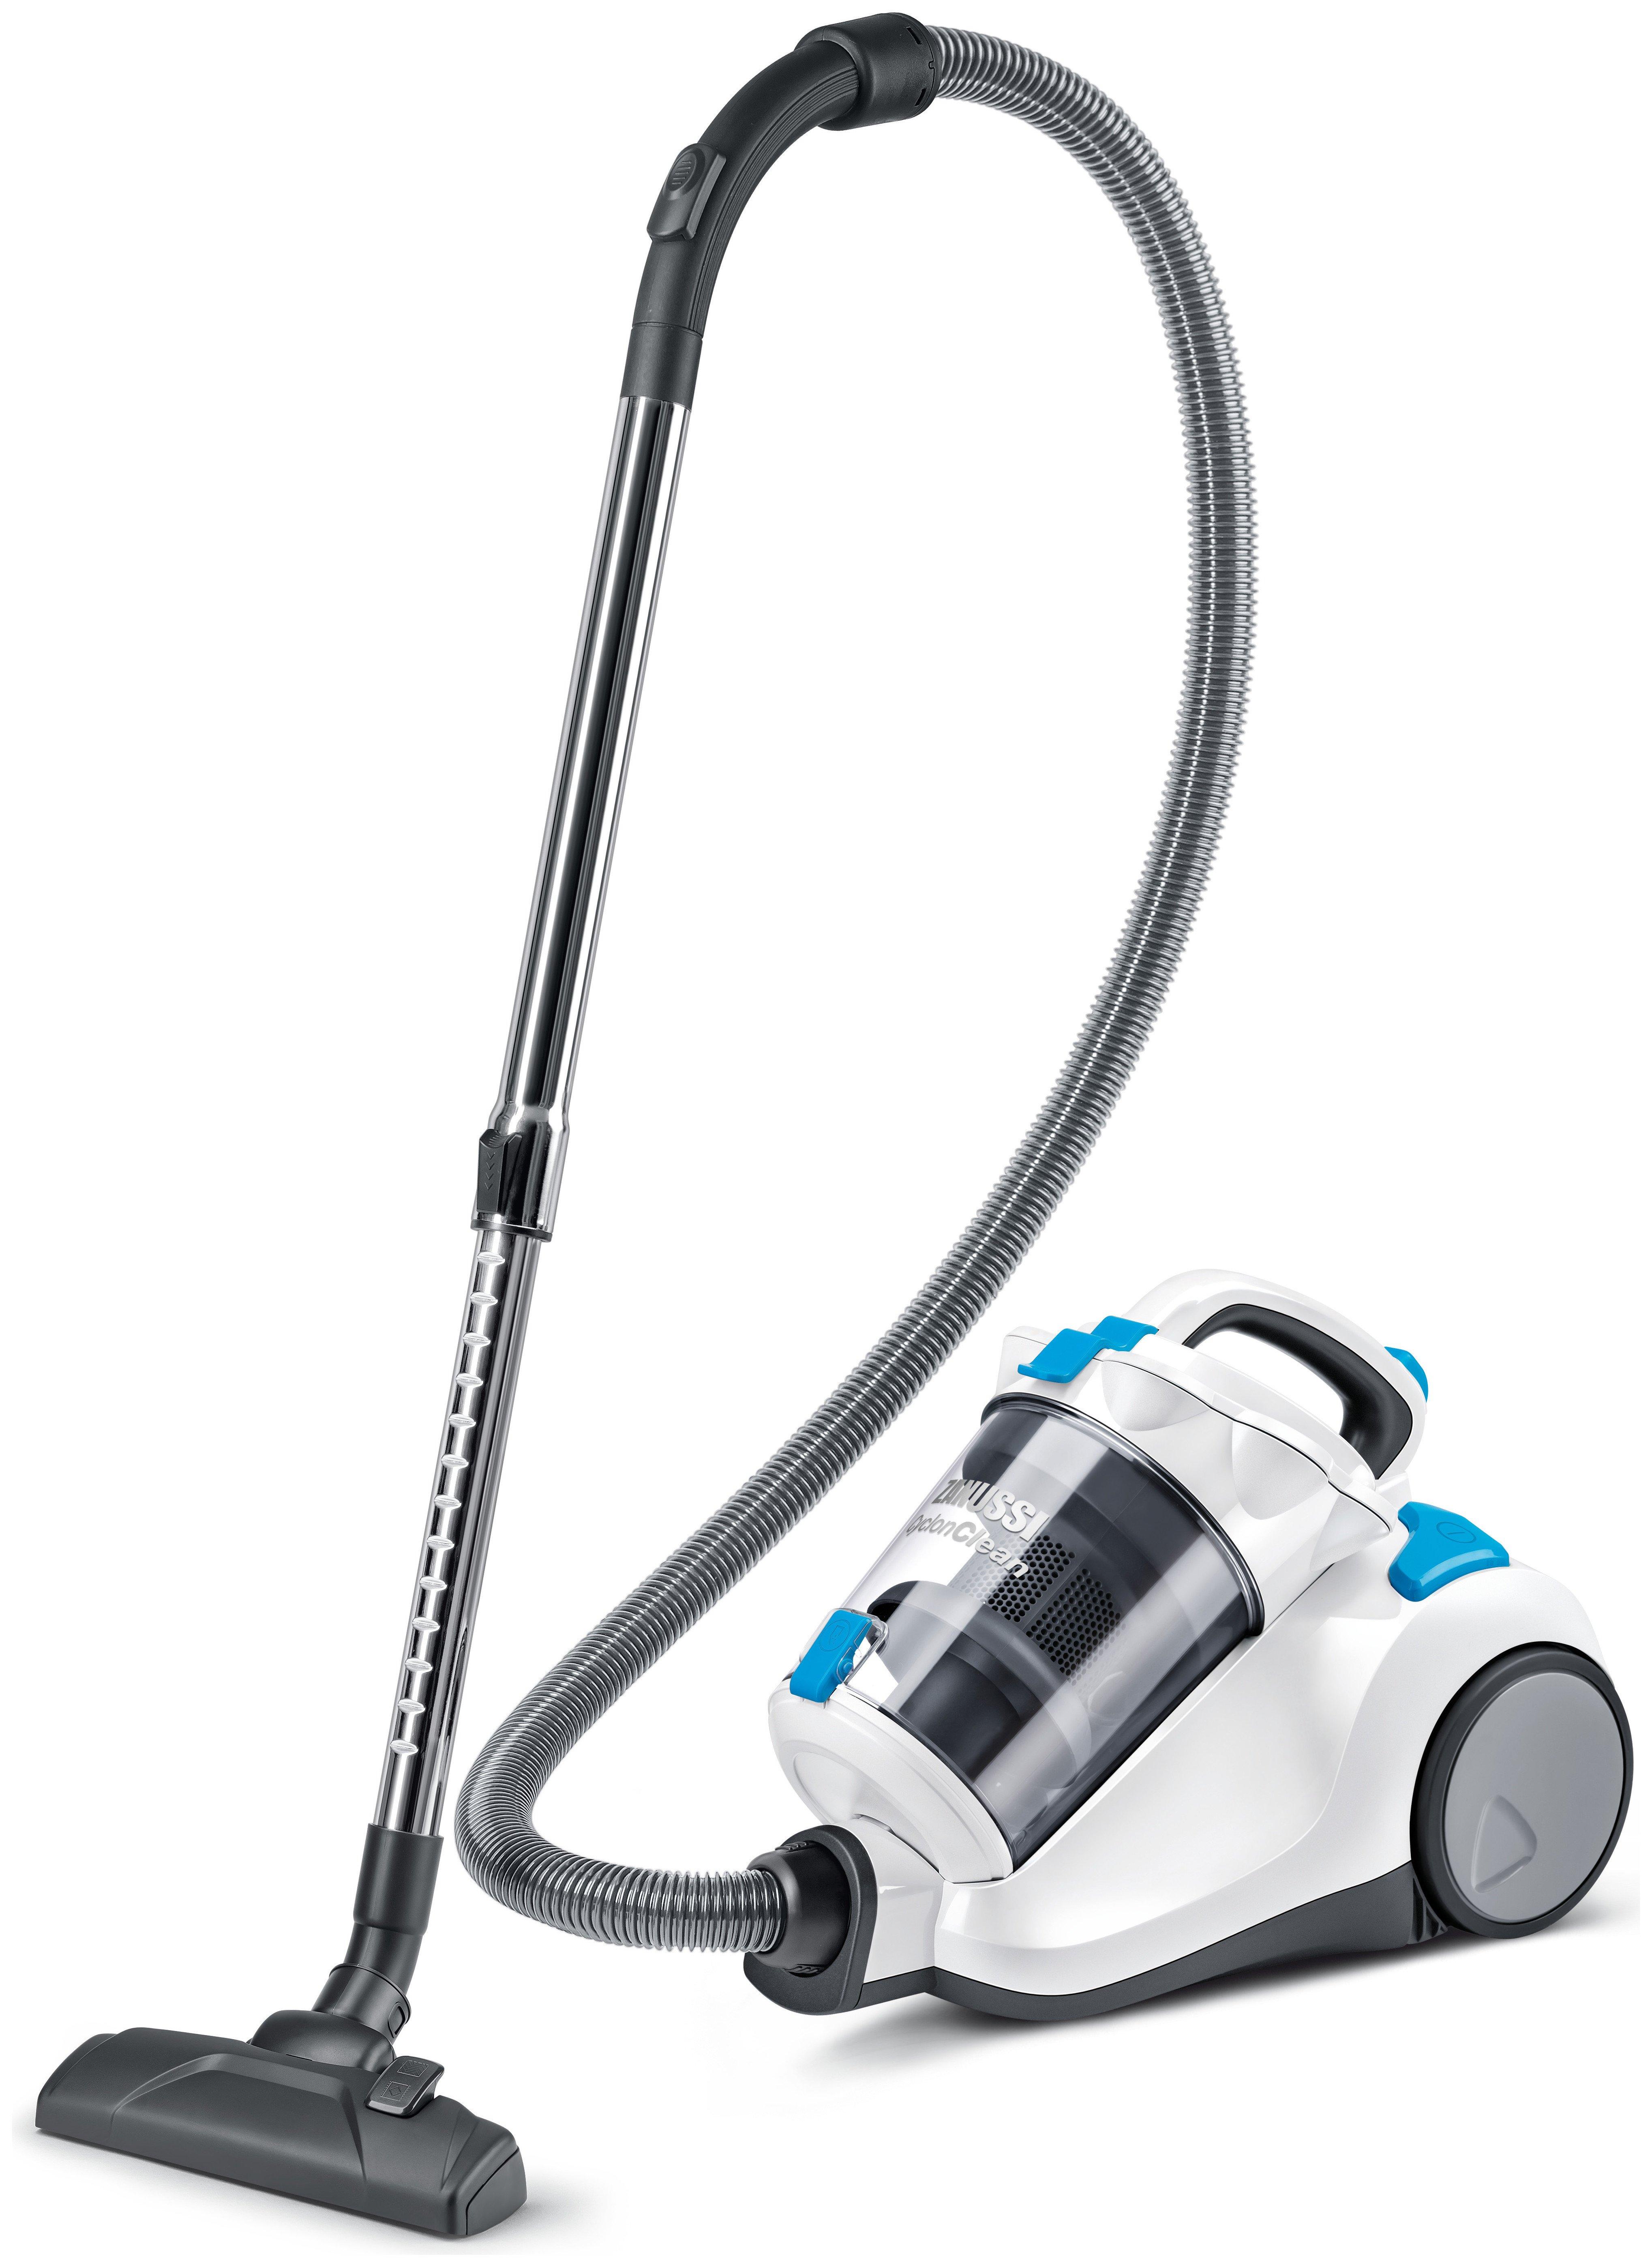 zanussi-zan7880ukel-pet-bagless-cylinder-vacuum-cleaner